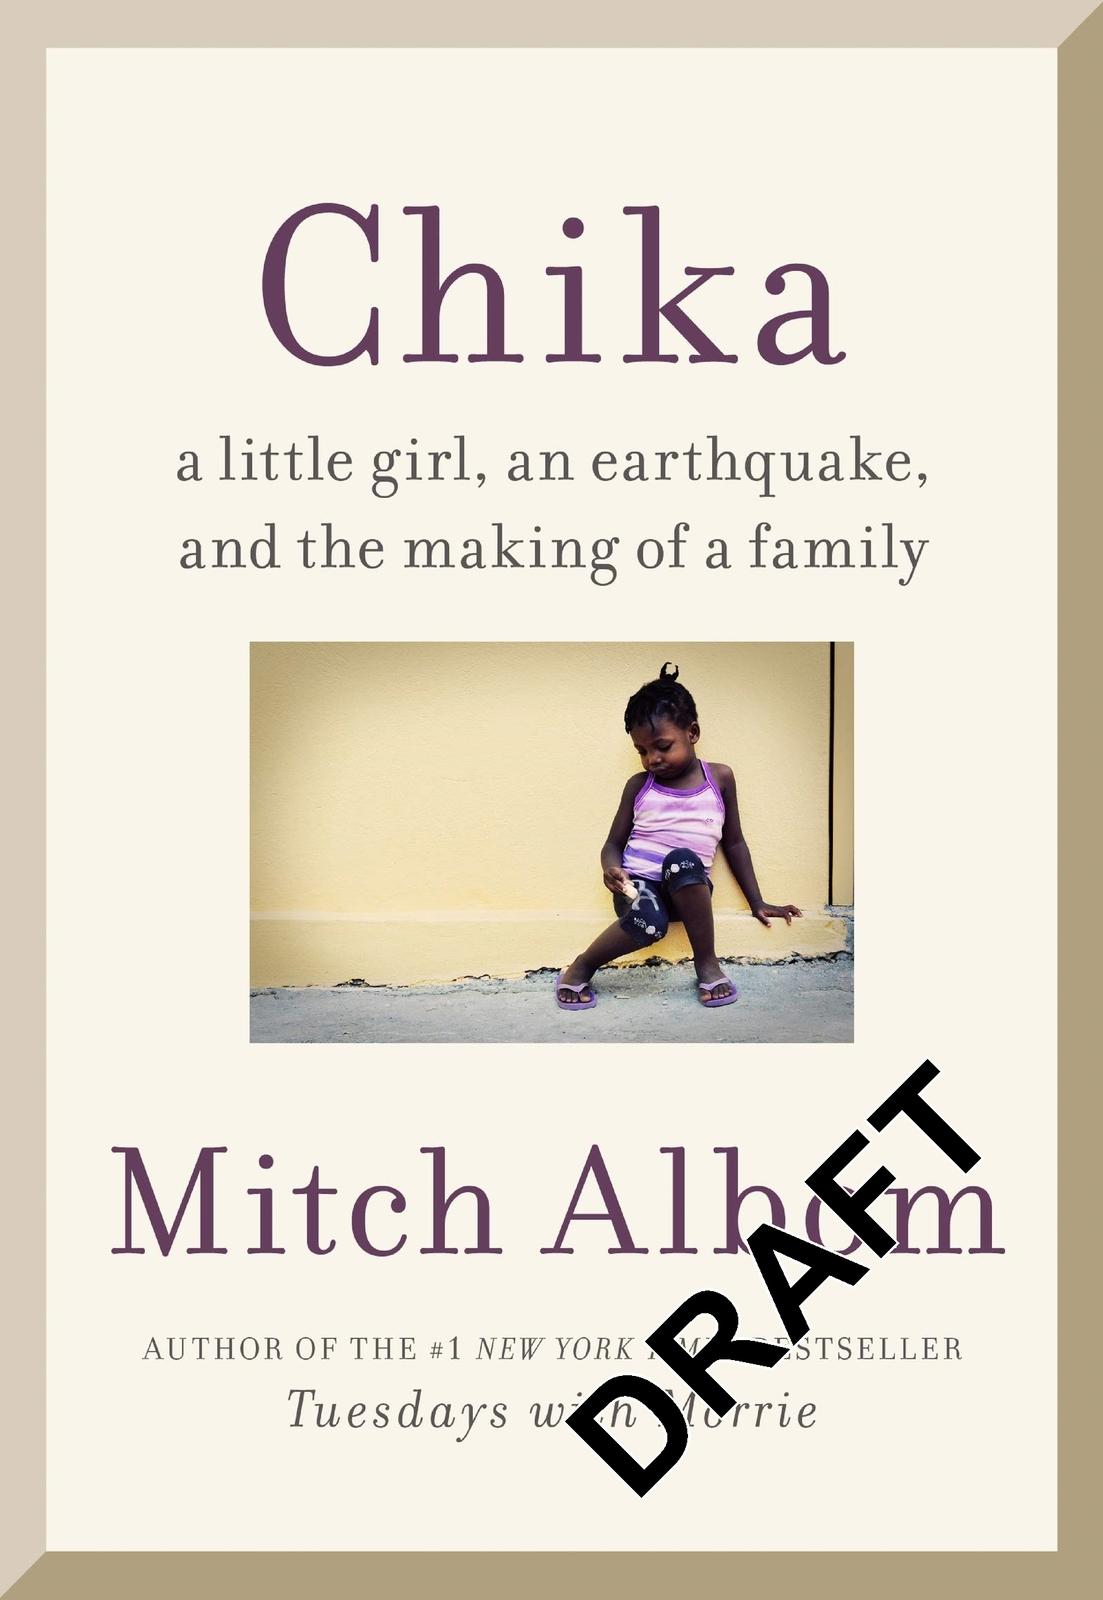 Chika by Mitch Albom image